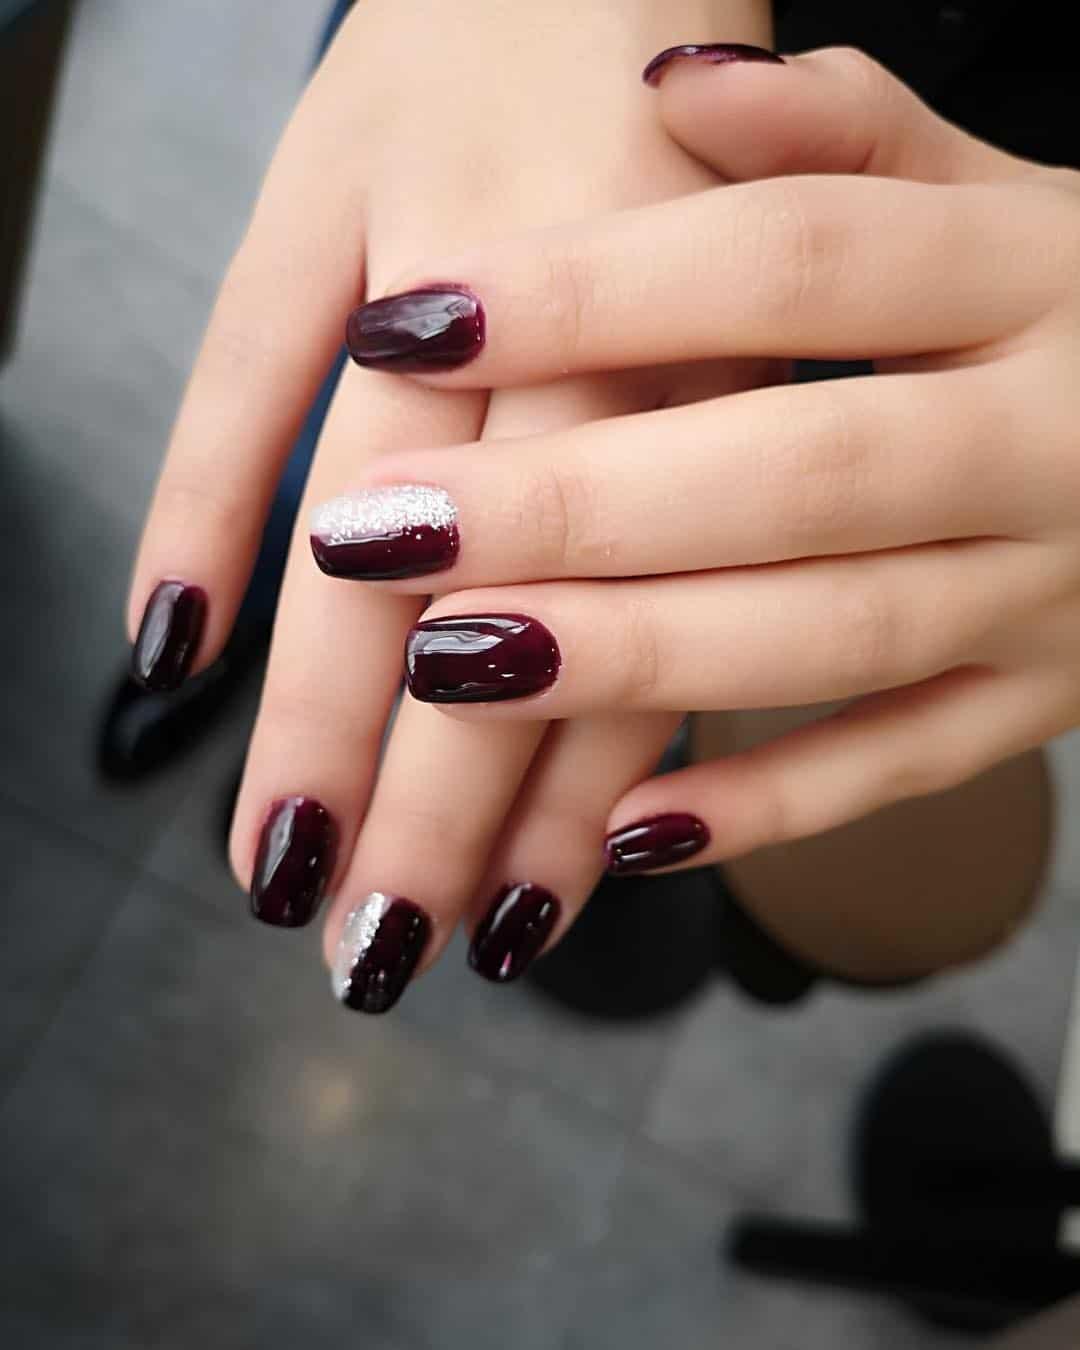 Nail-polish-2019-New-dazzling-and-classy-palette-of-nail-varnish-2019